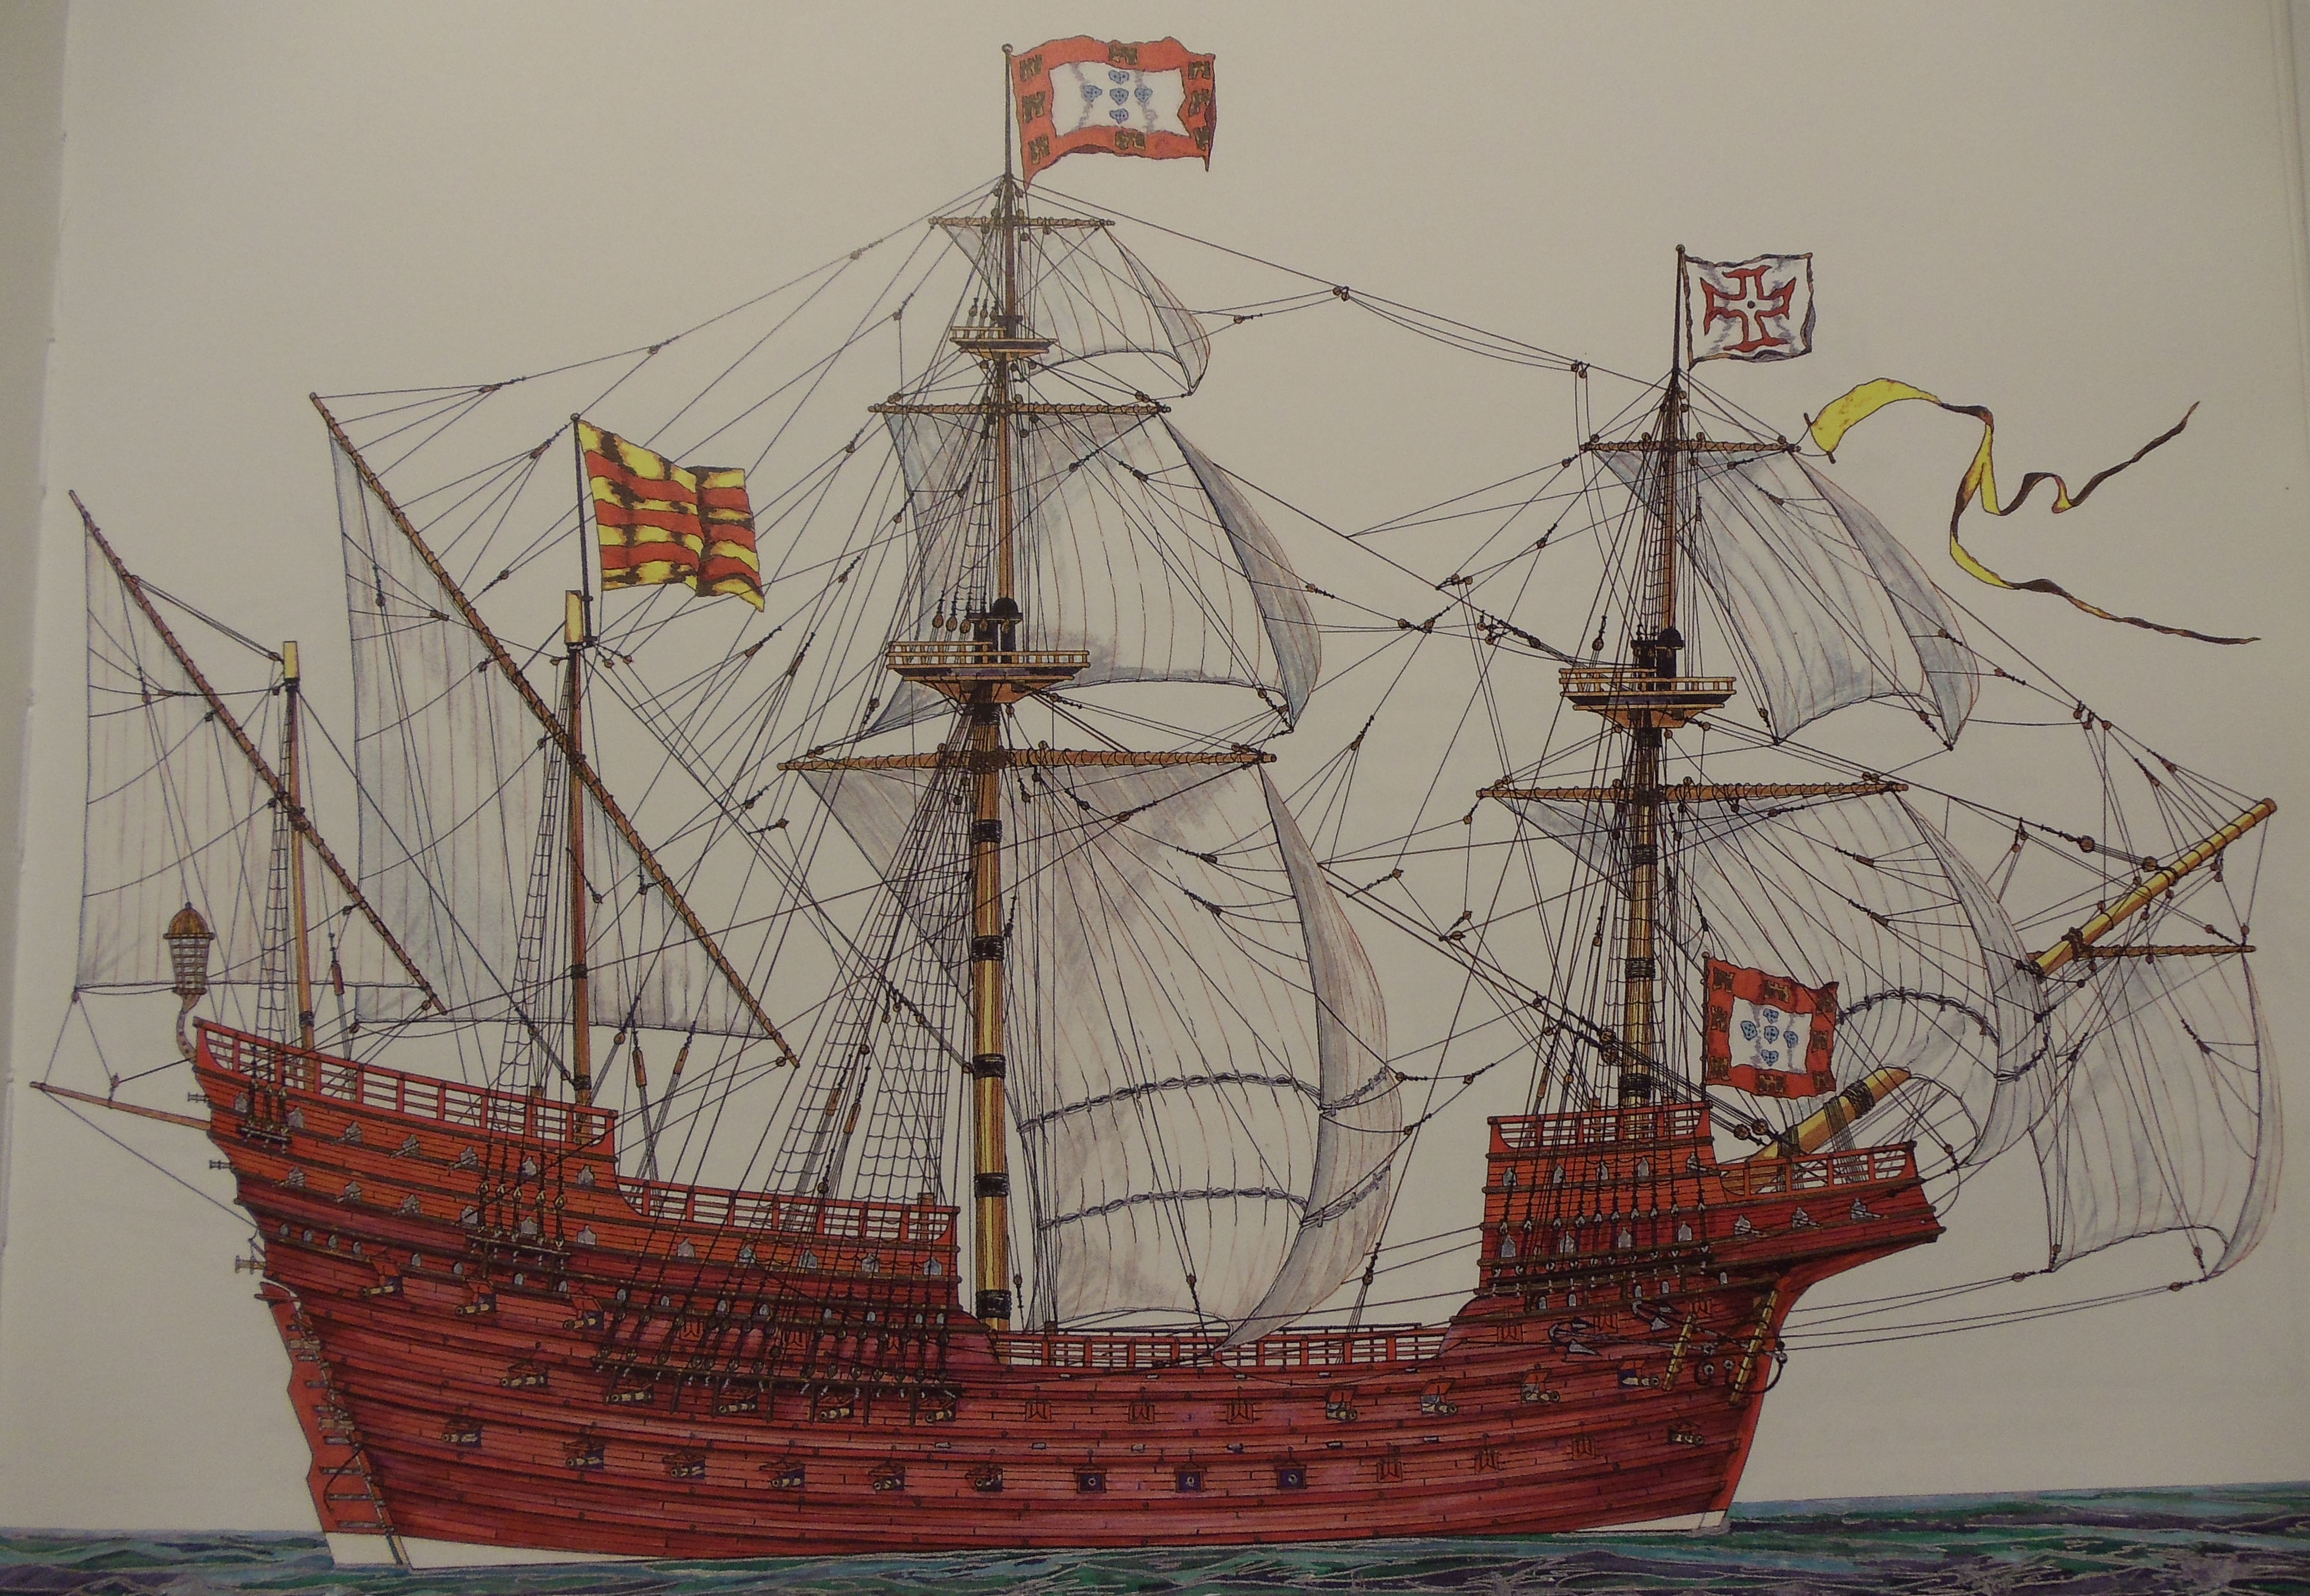 Portuguese Carrack - 1585 - Wheatley